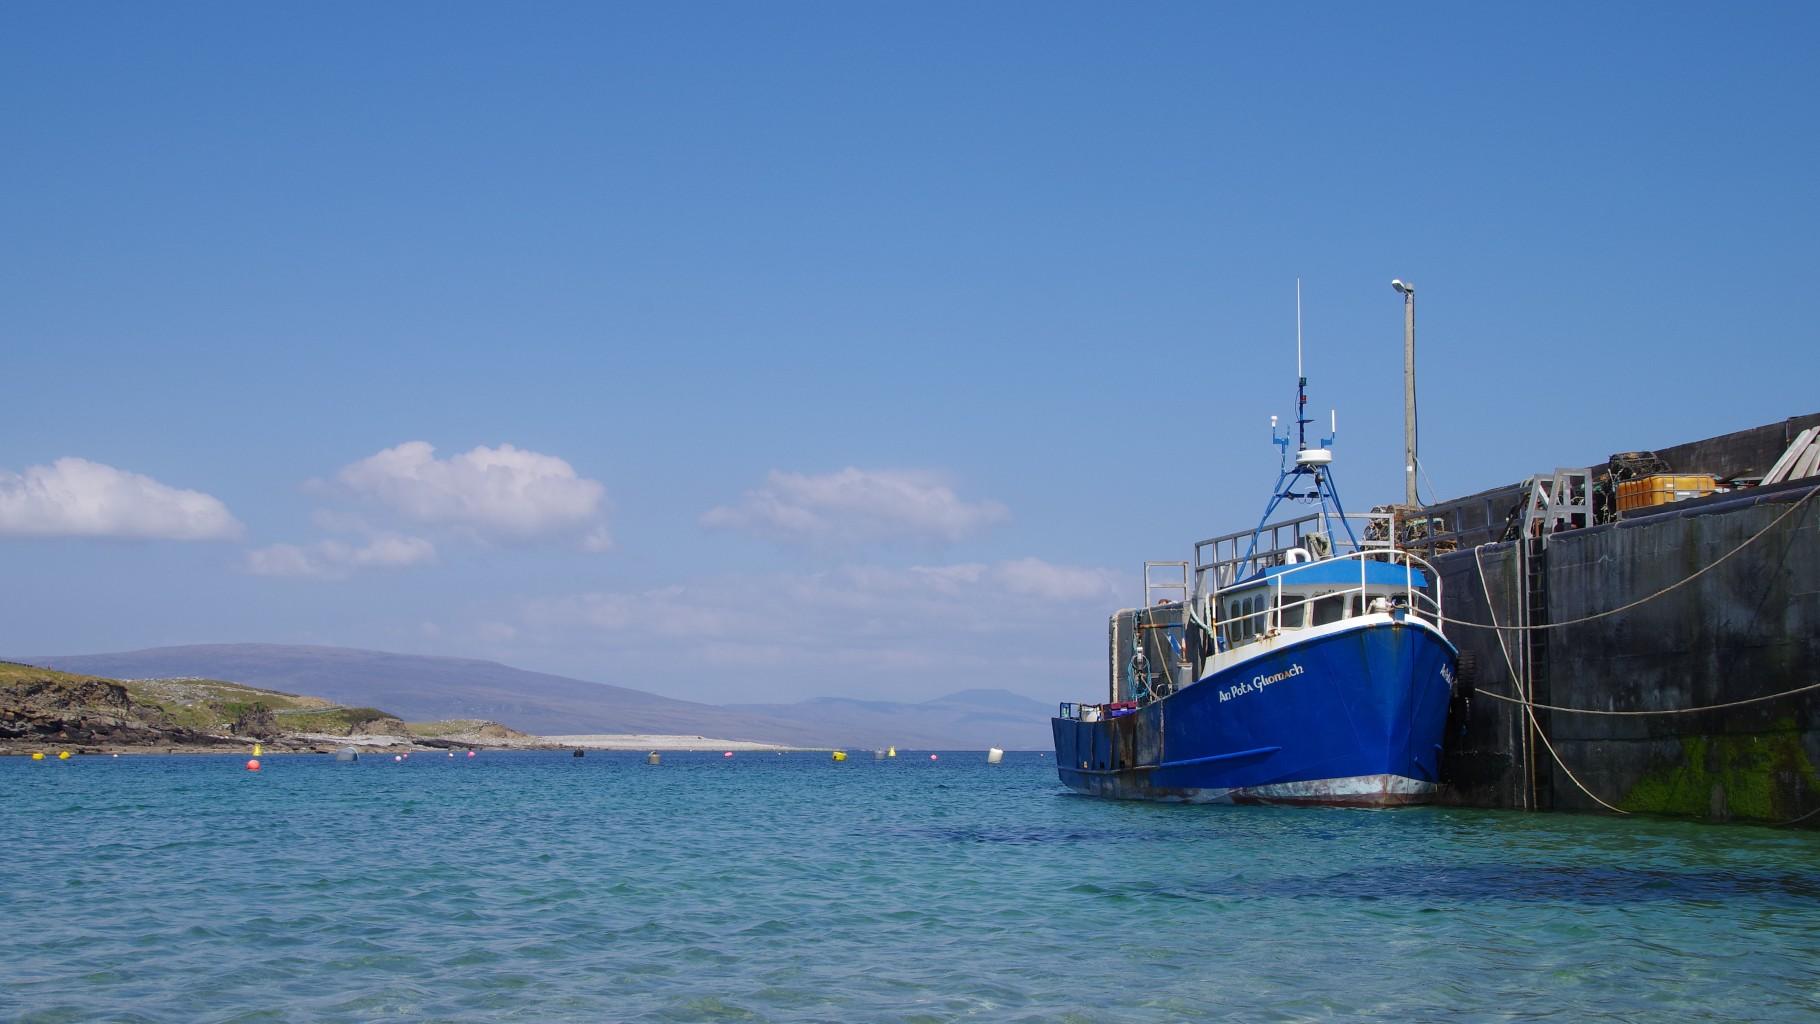 Clare Island Harbour